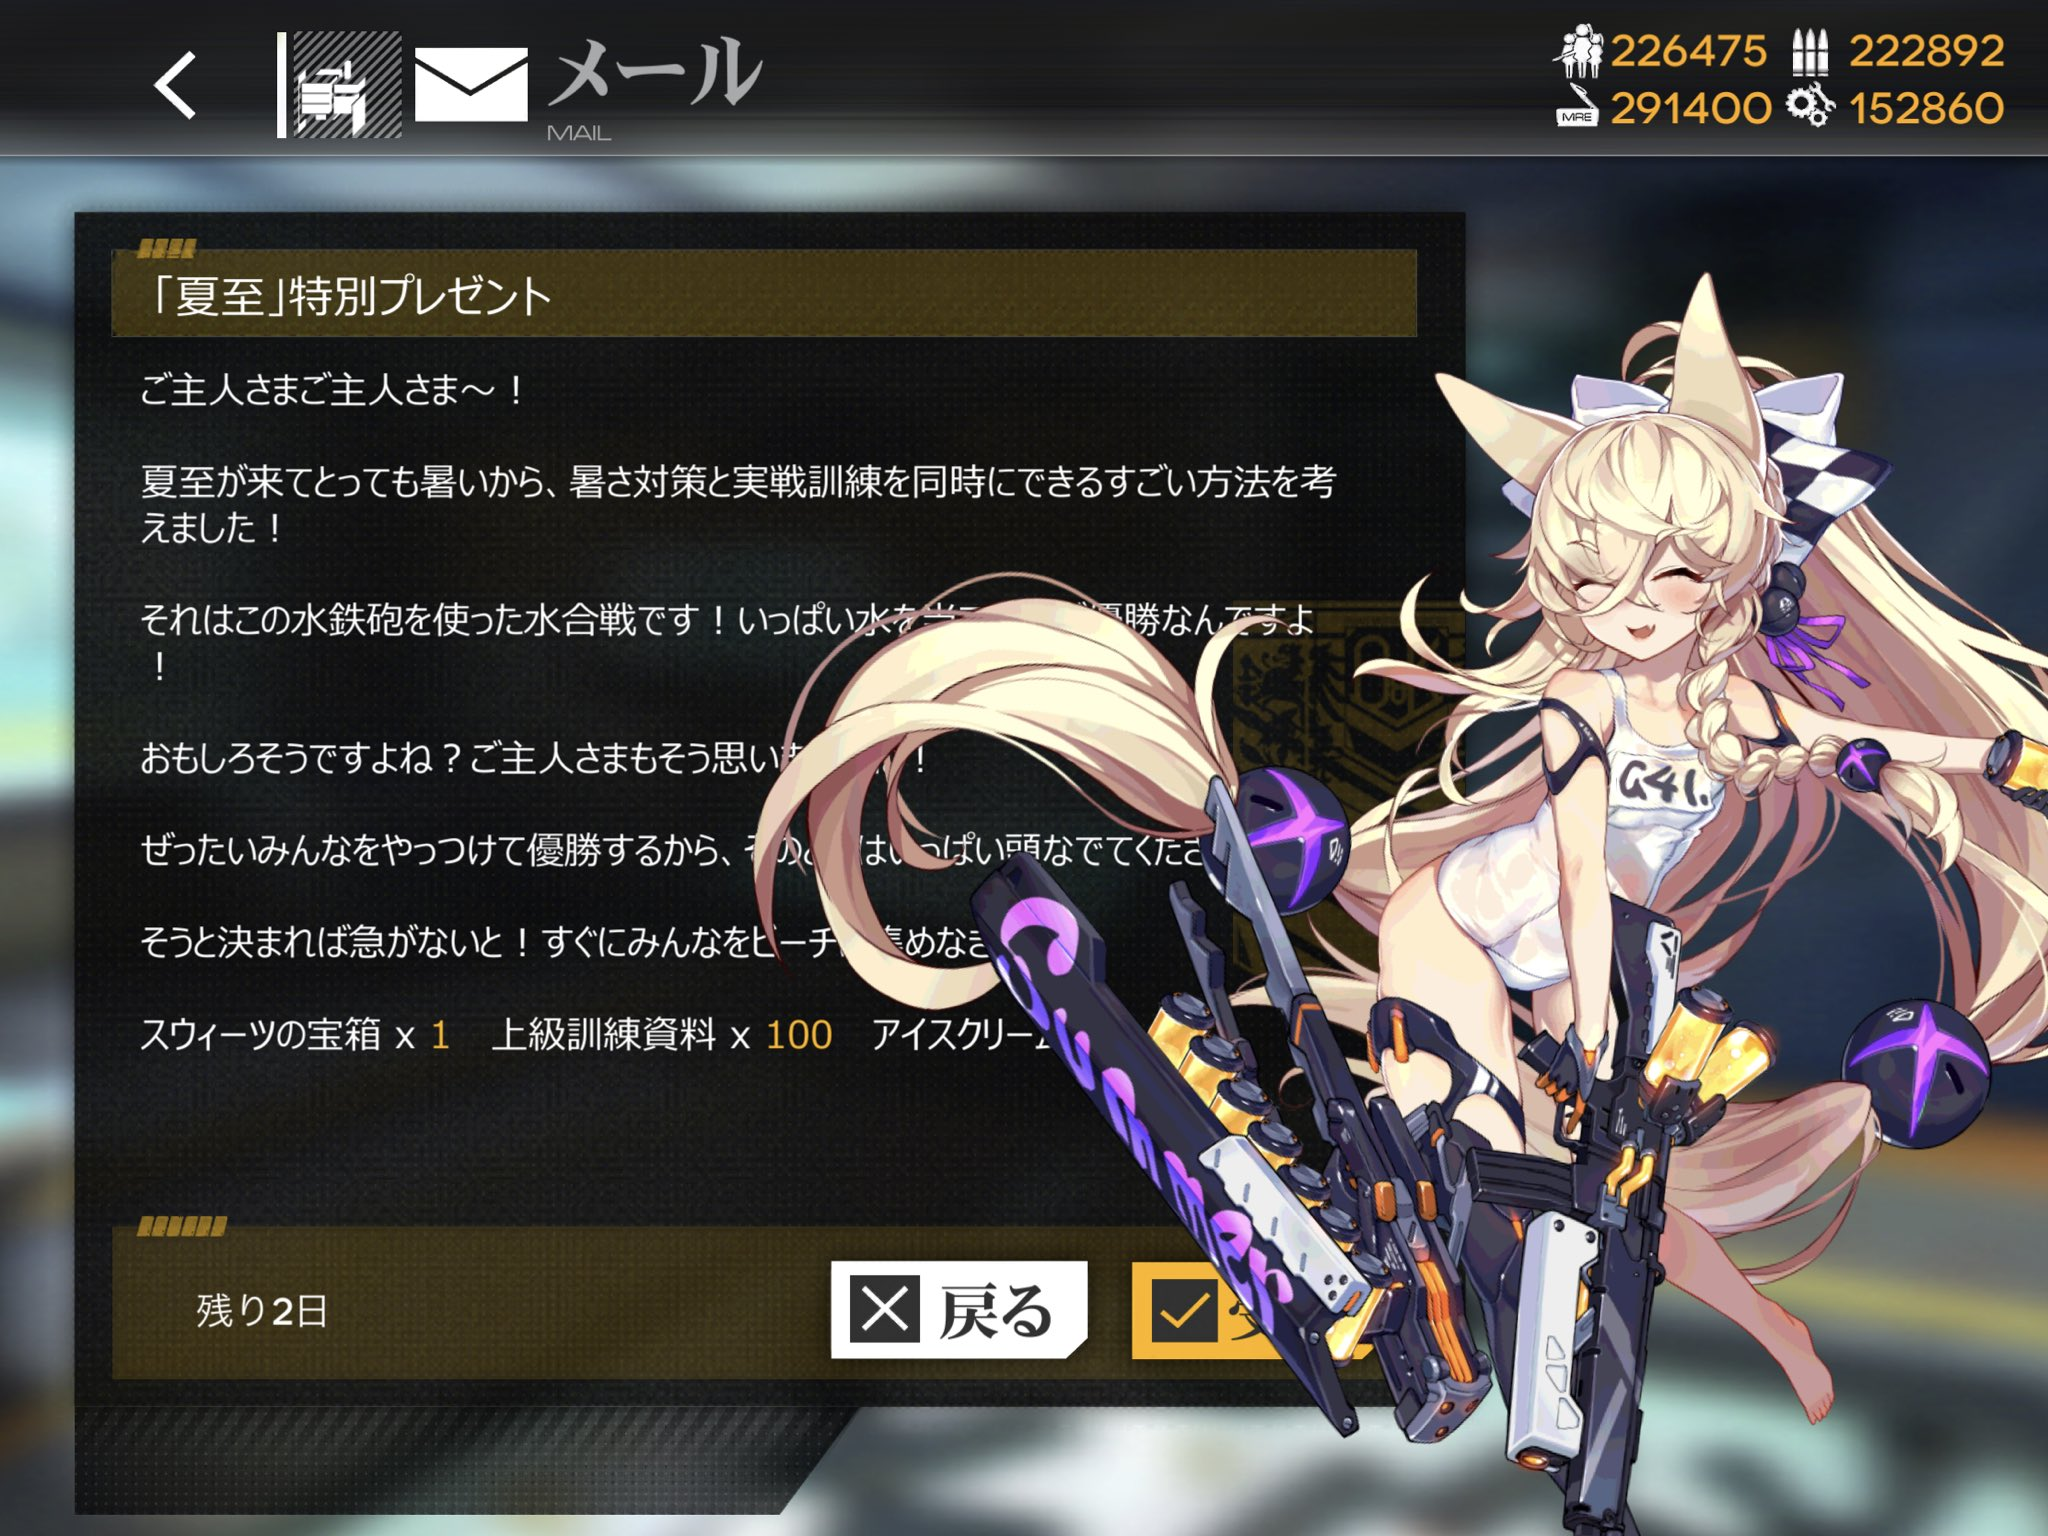 G41_20200621.jpg